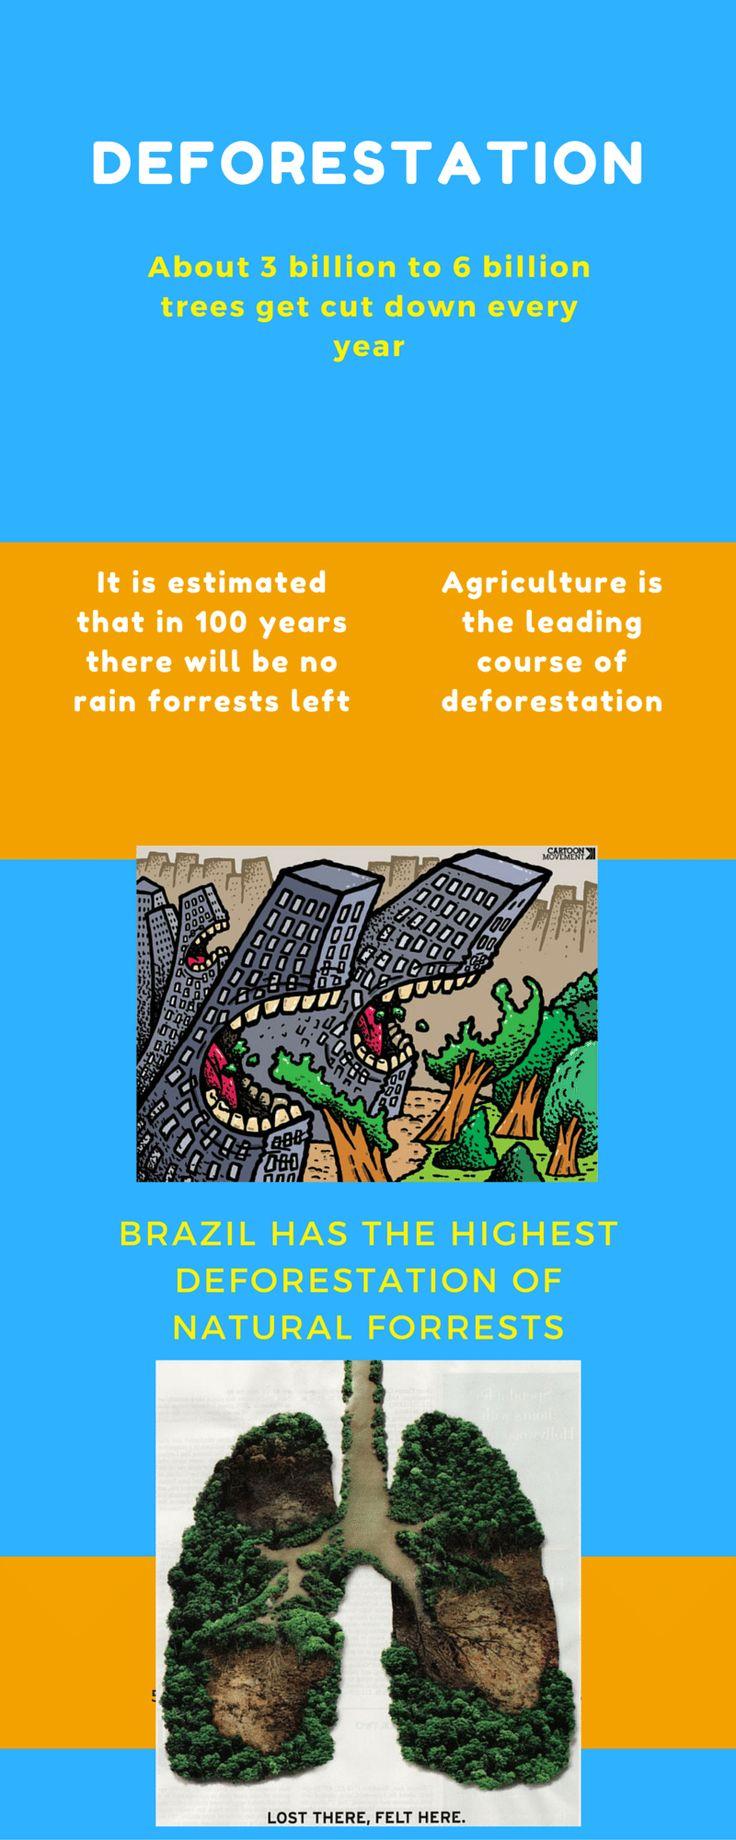 50 15 25 Deforestation About 3 billion to 6 billion trees get cut d...